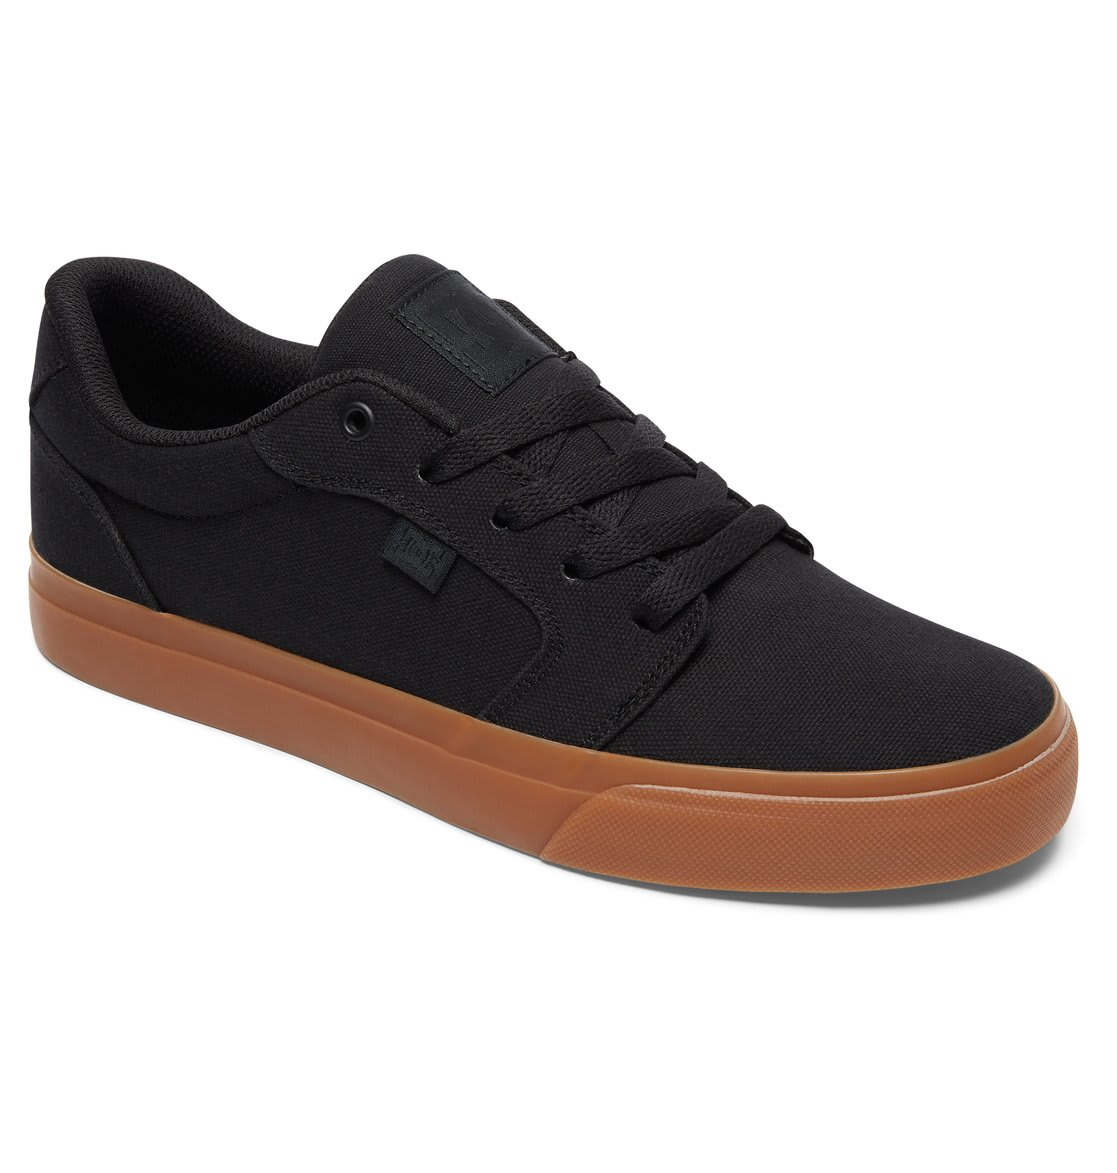 black skateboard - Ecosia fcda3eac6